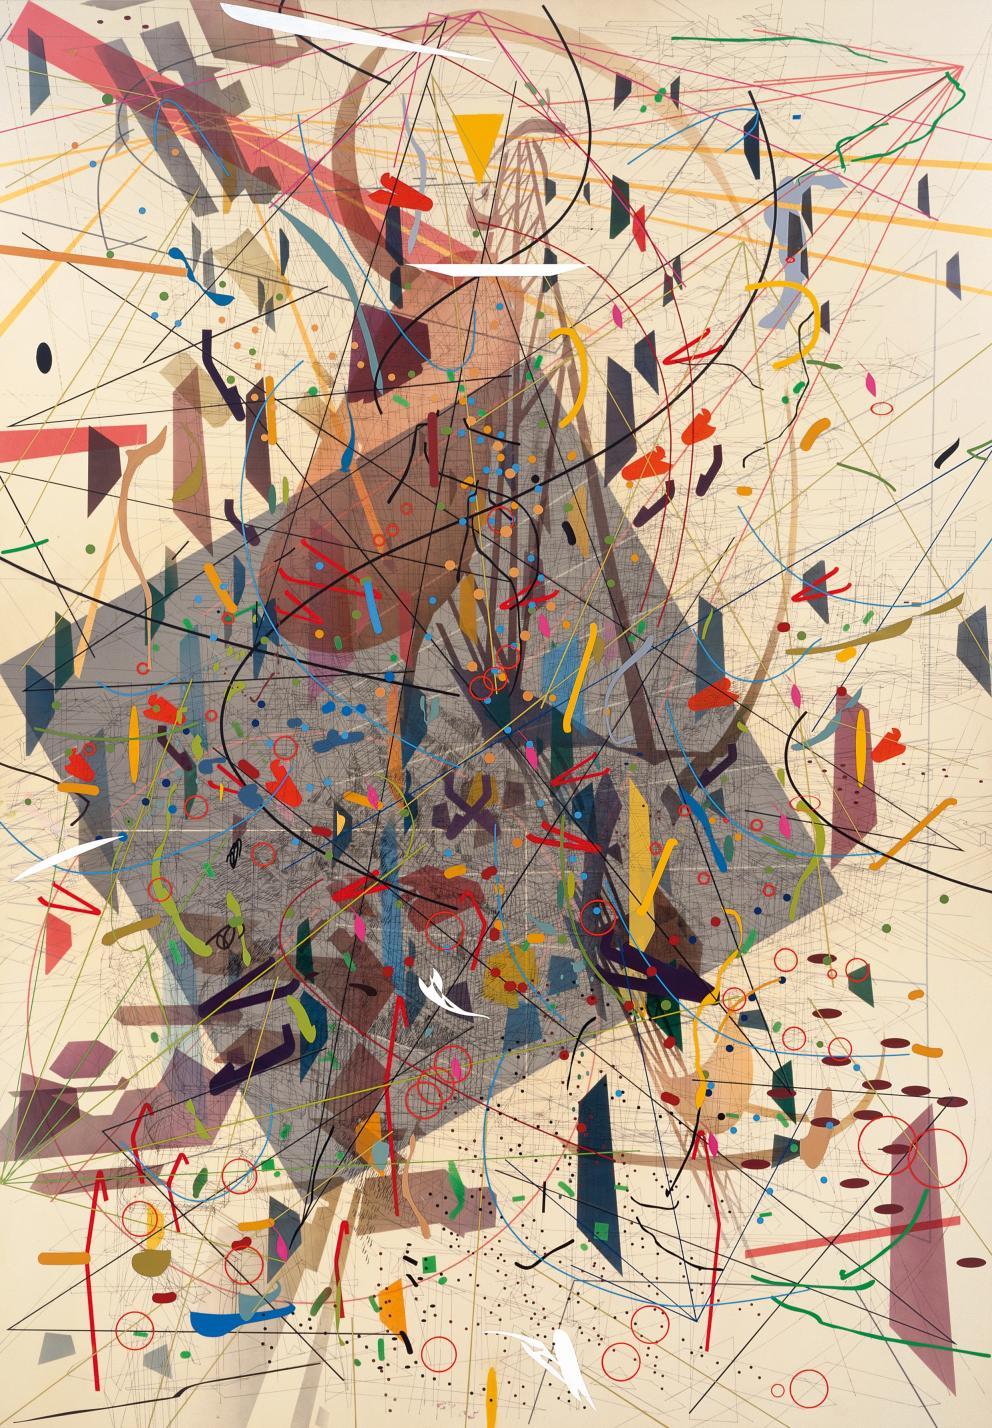 Zero Canyon (A Dissimulation) (2006) - Julie Mehretu